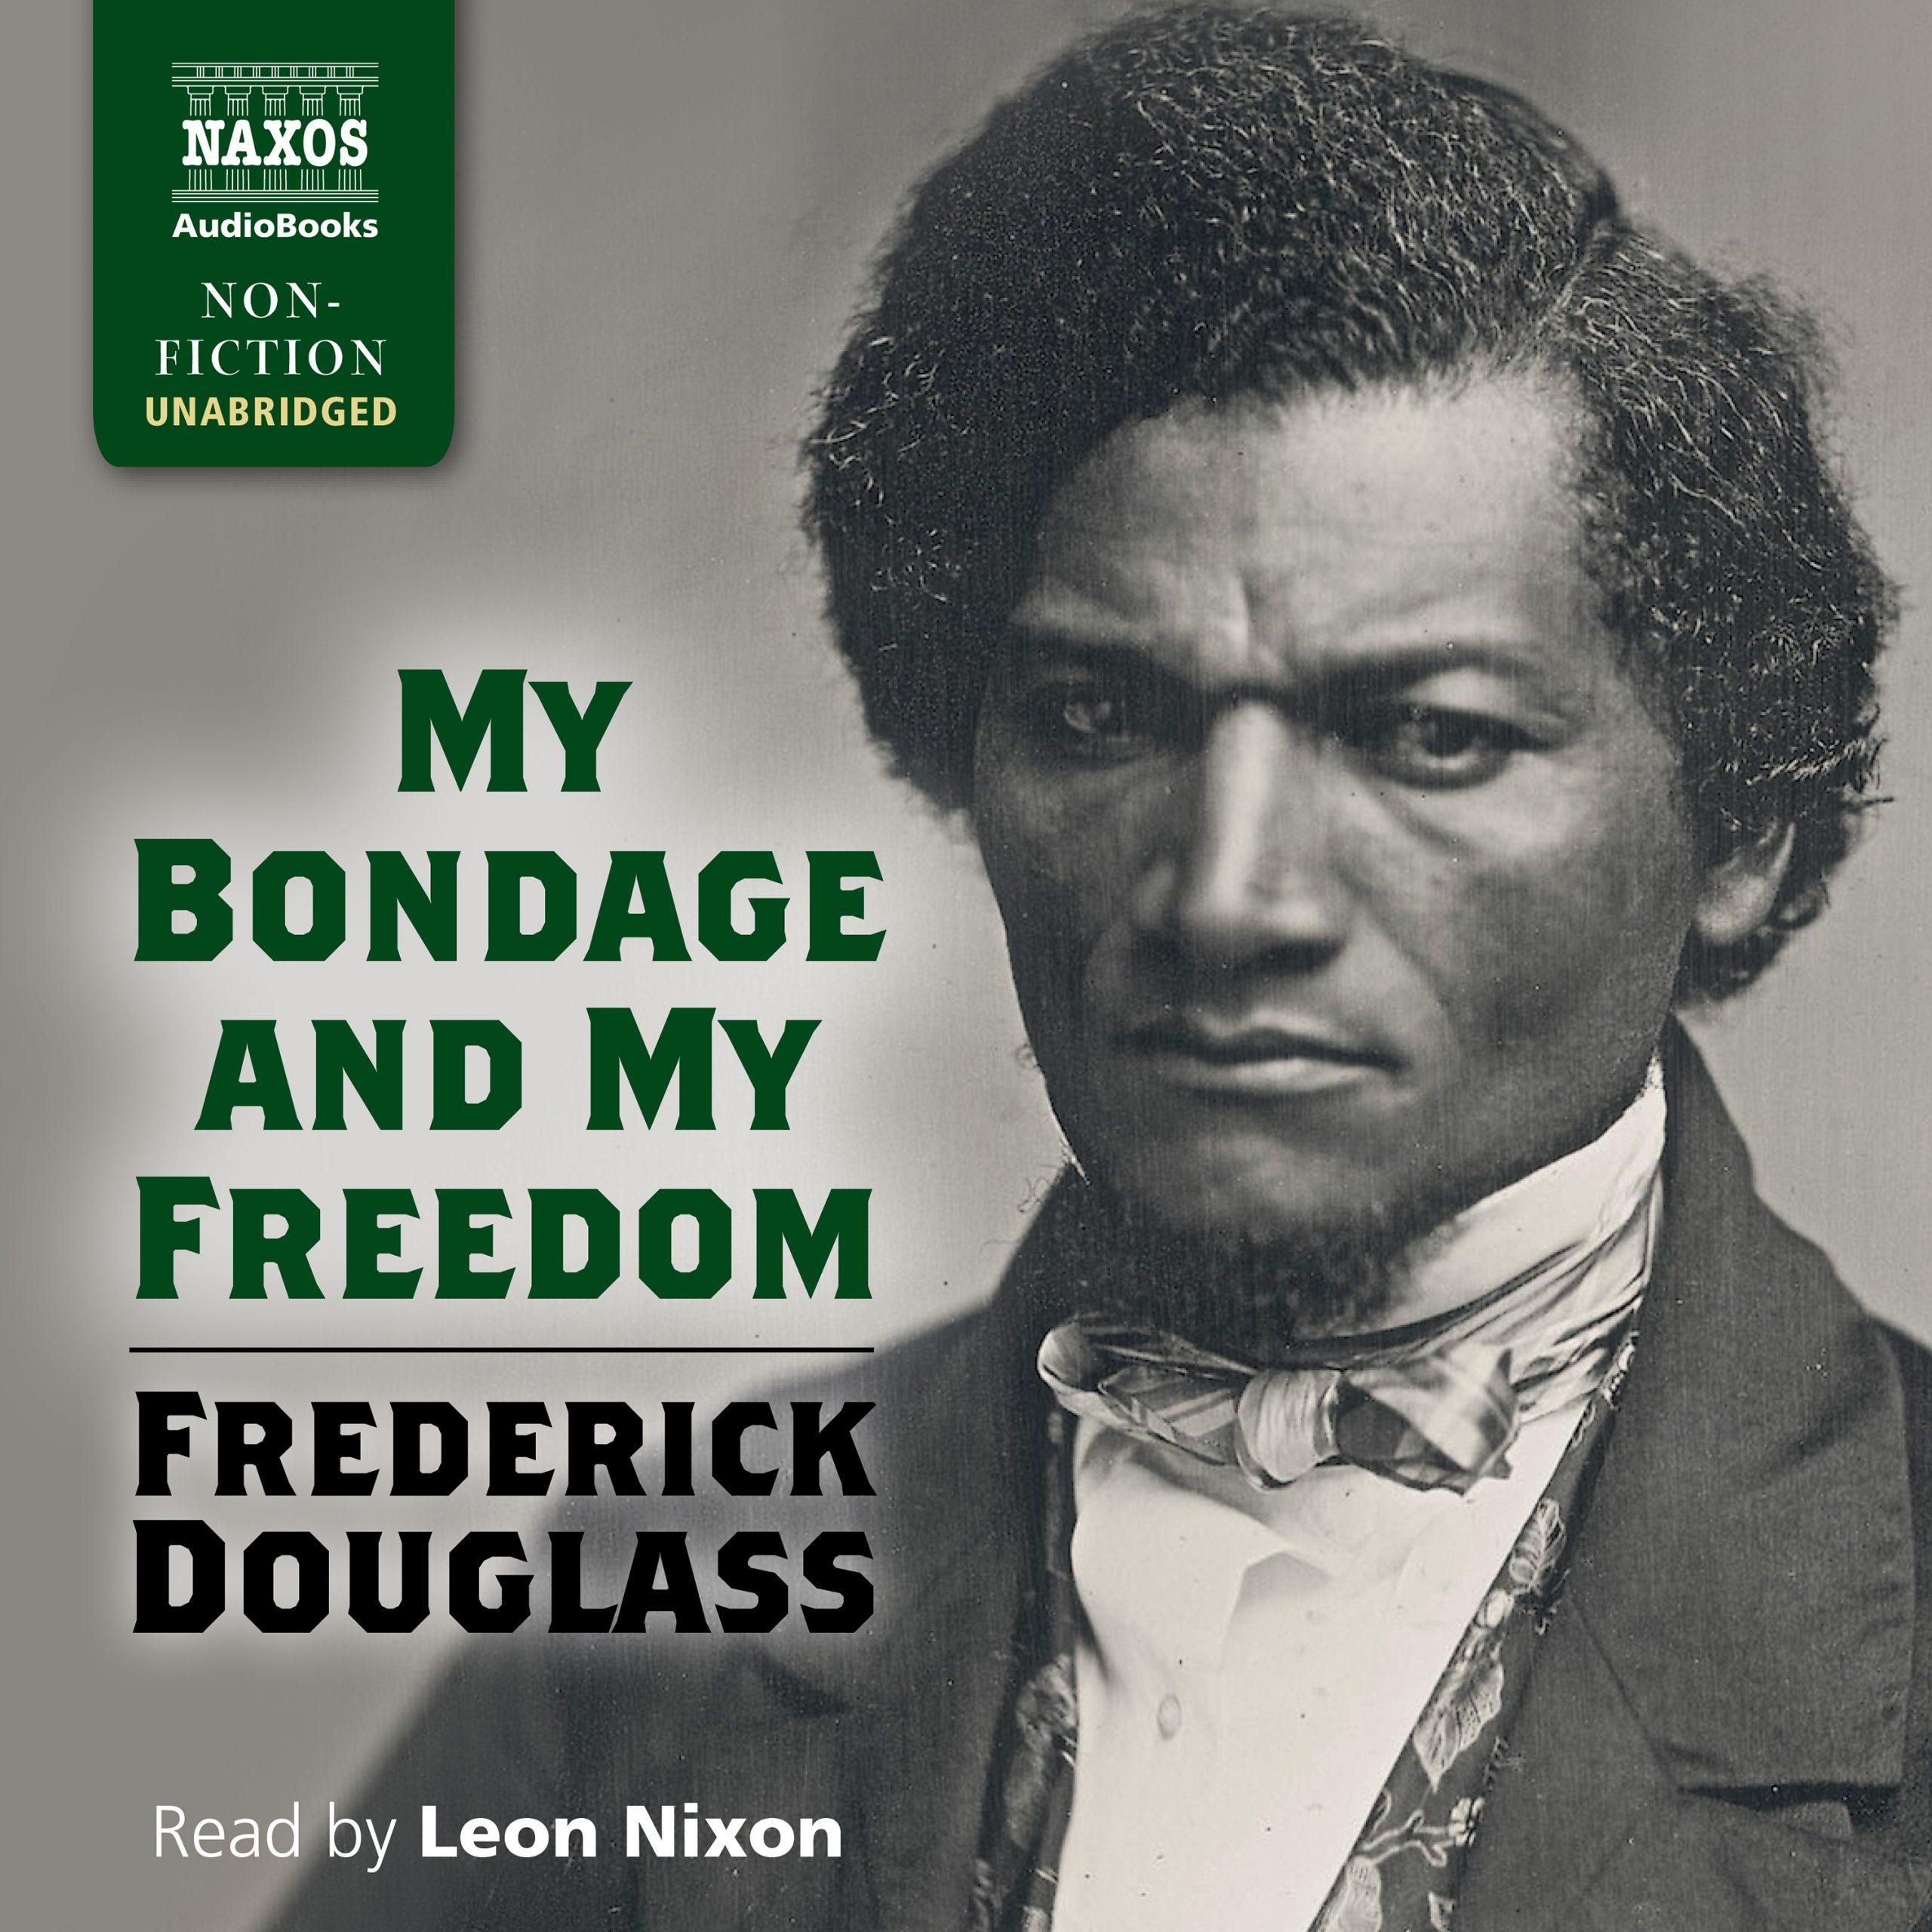 My Bondage and My Freedom (unabridged)